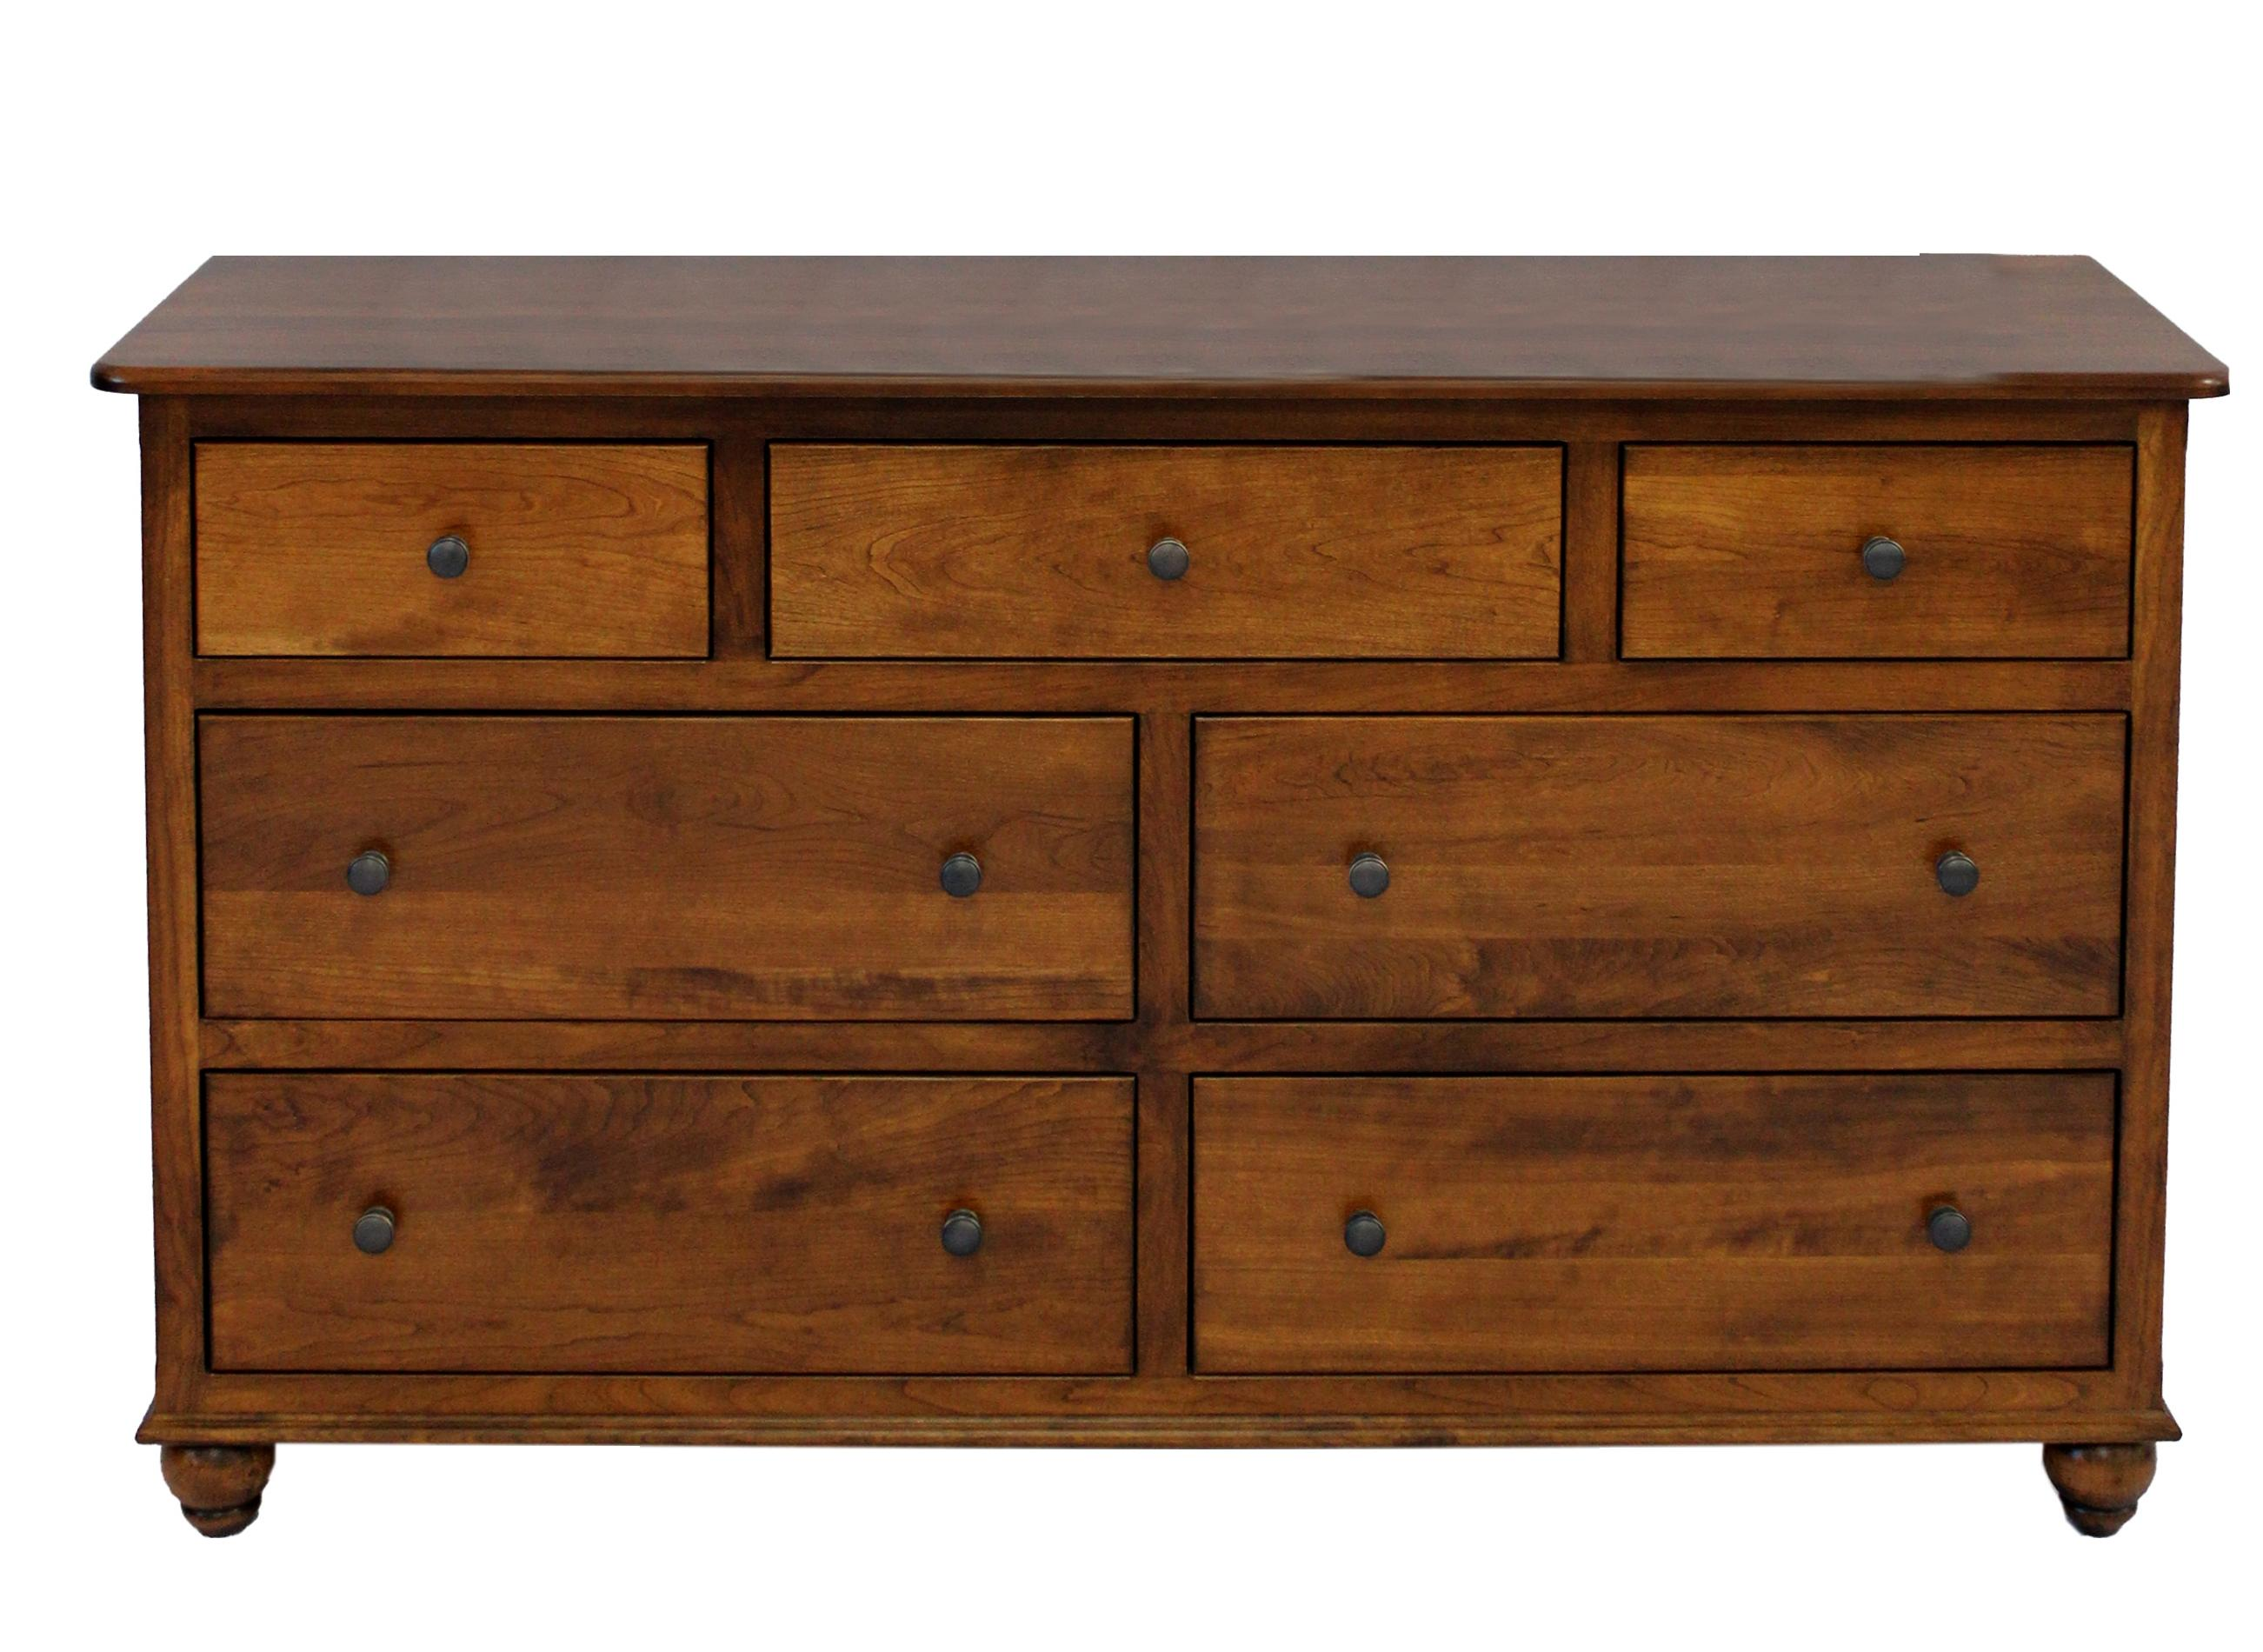 L.J. Gascho Furniture Covington Covington Dresser - Item Number: 2040-62